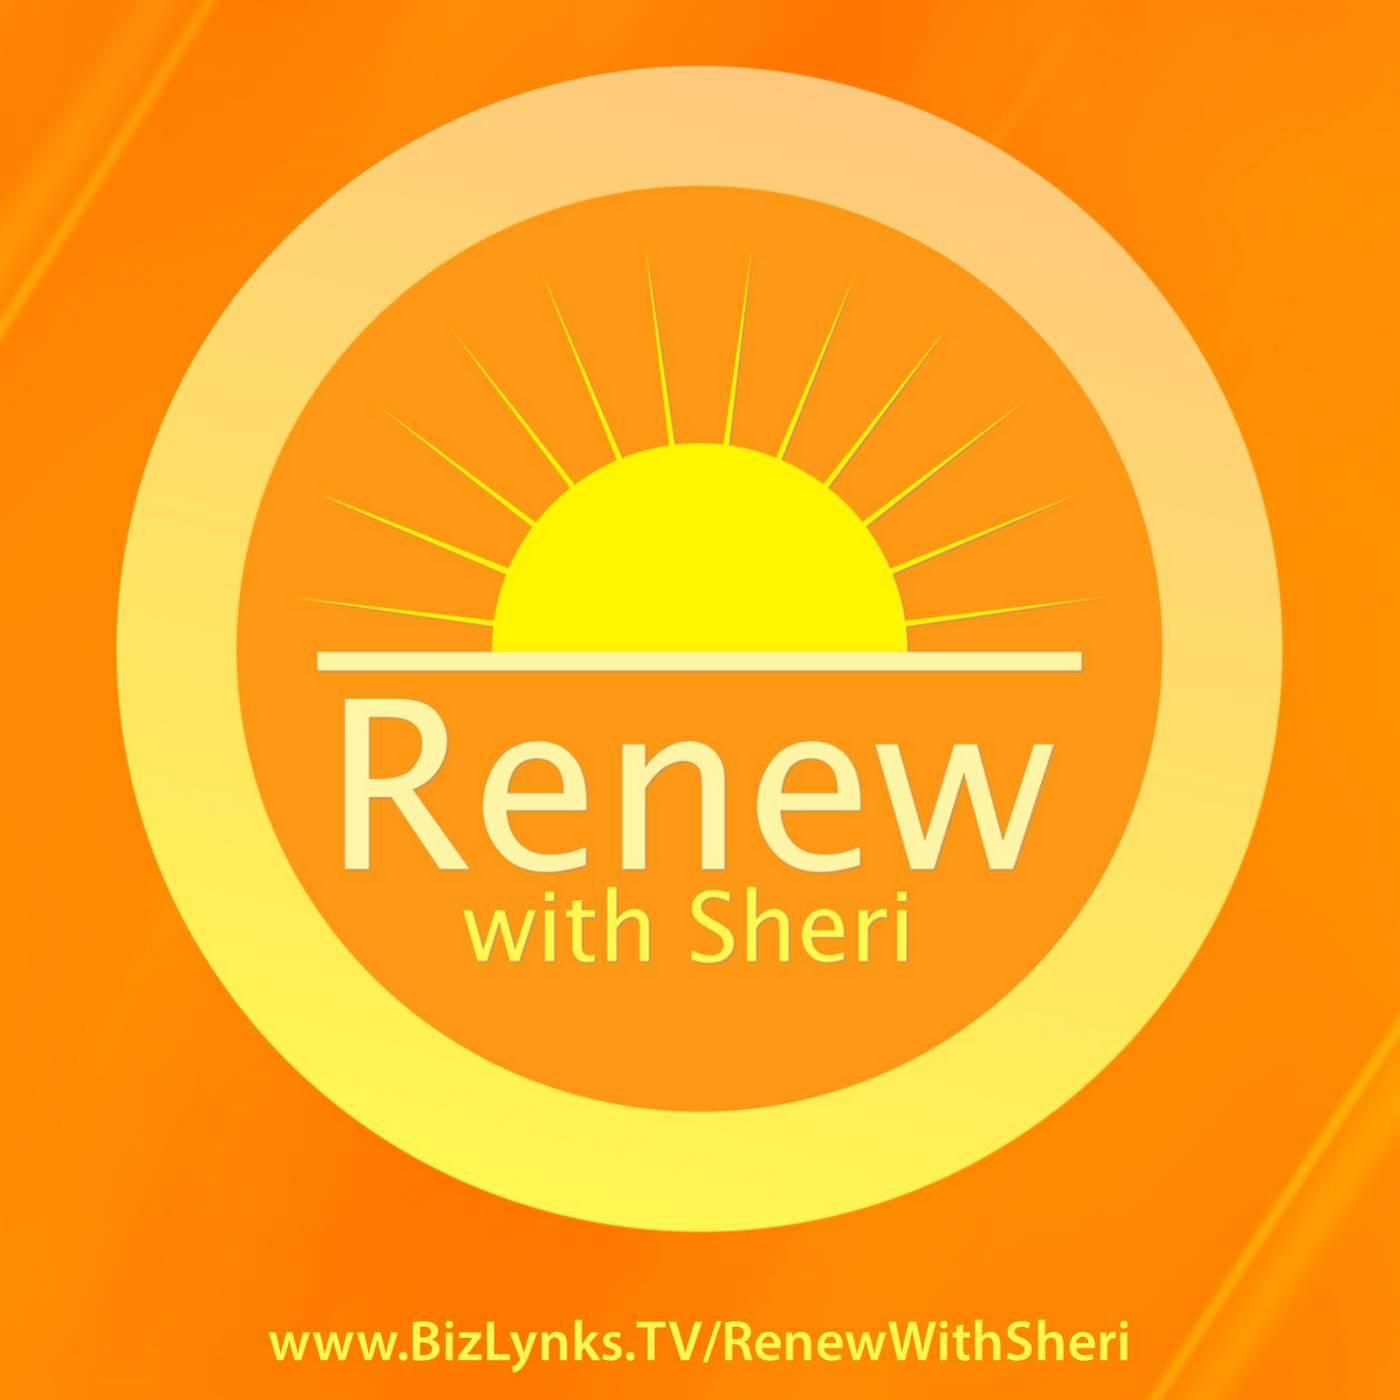 Renew with Sheri | BizLynks TV Network